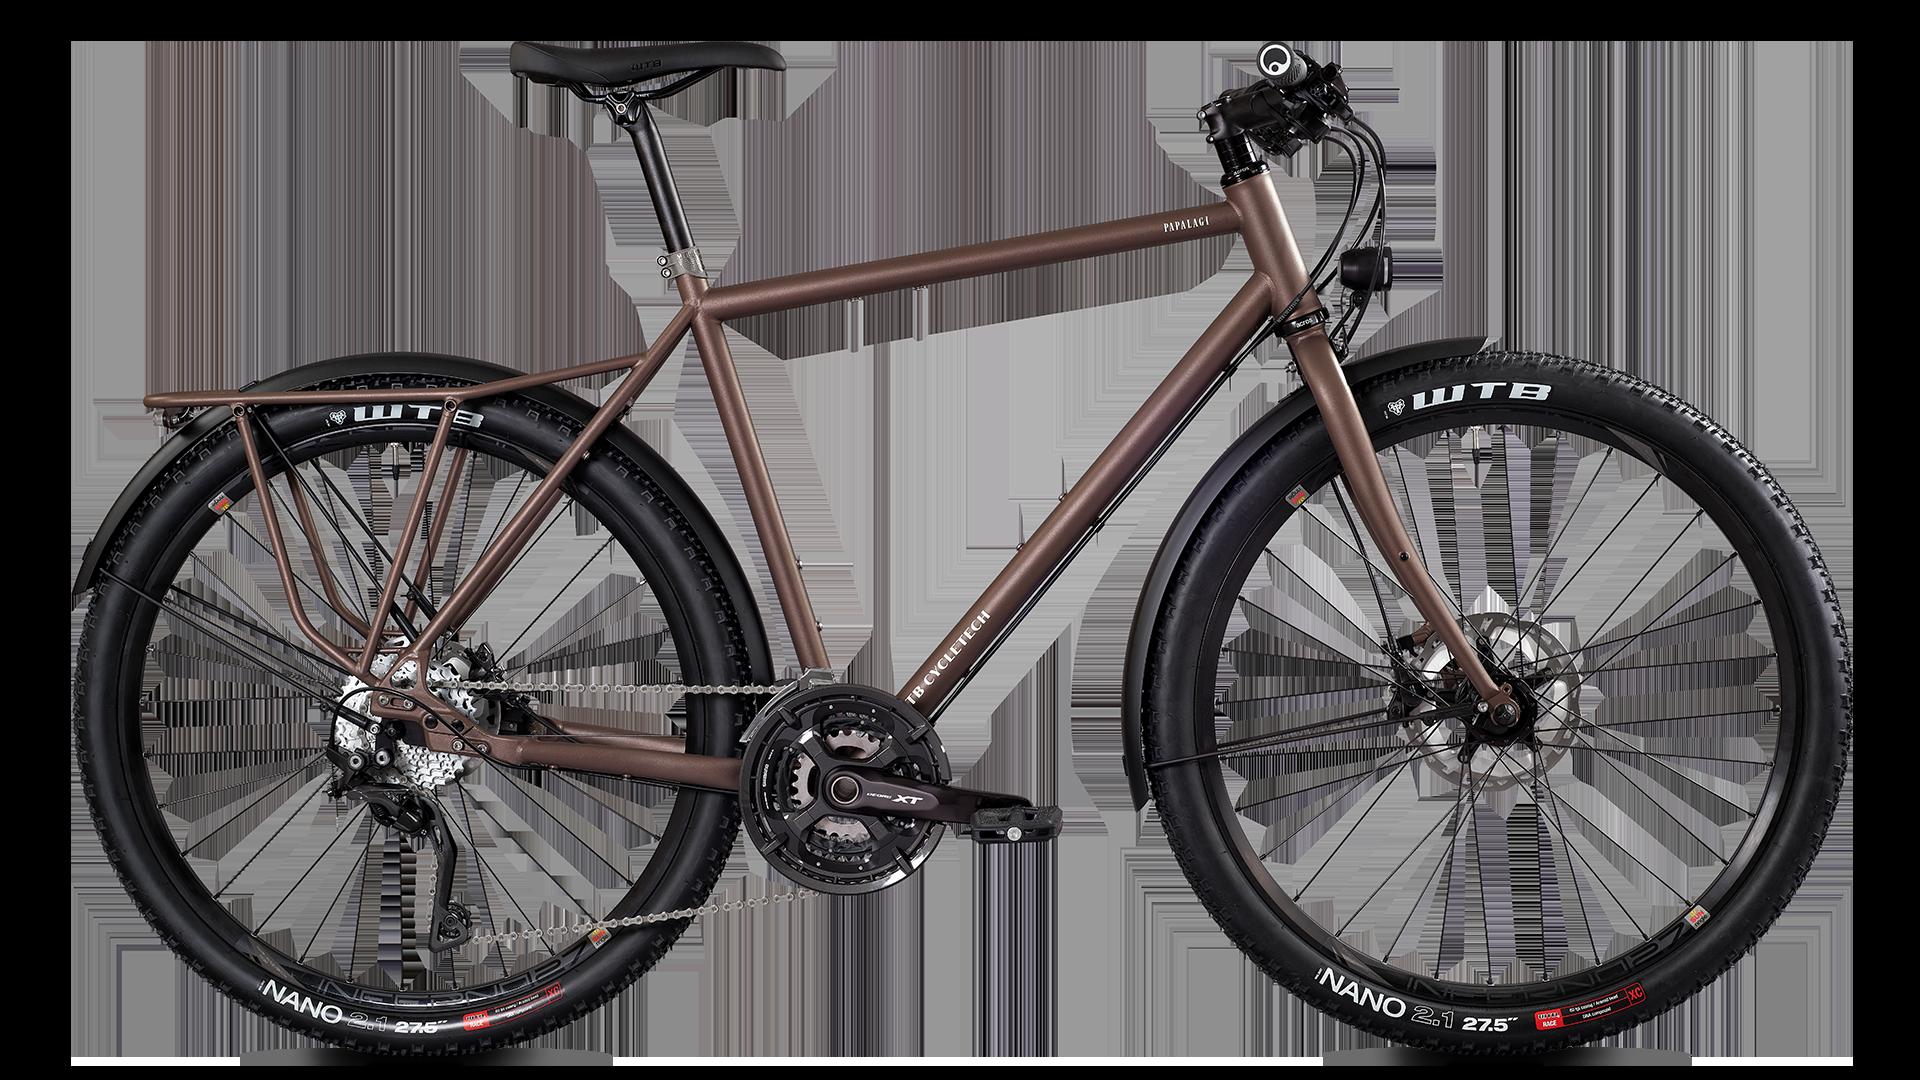 Modell - Papalagi Gi - MTB Cycletech